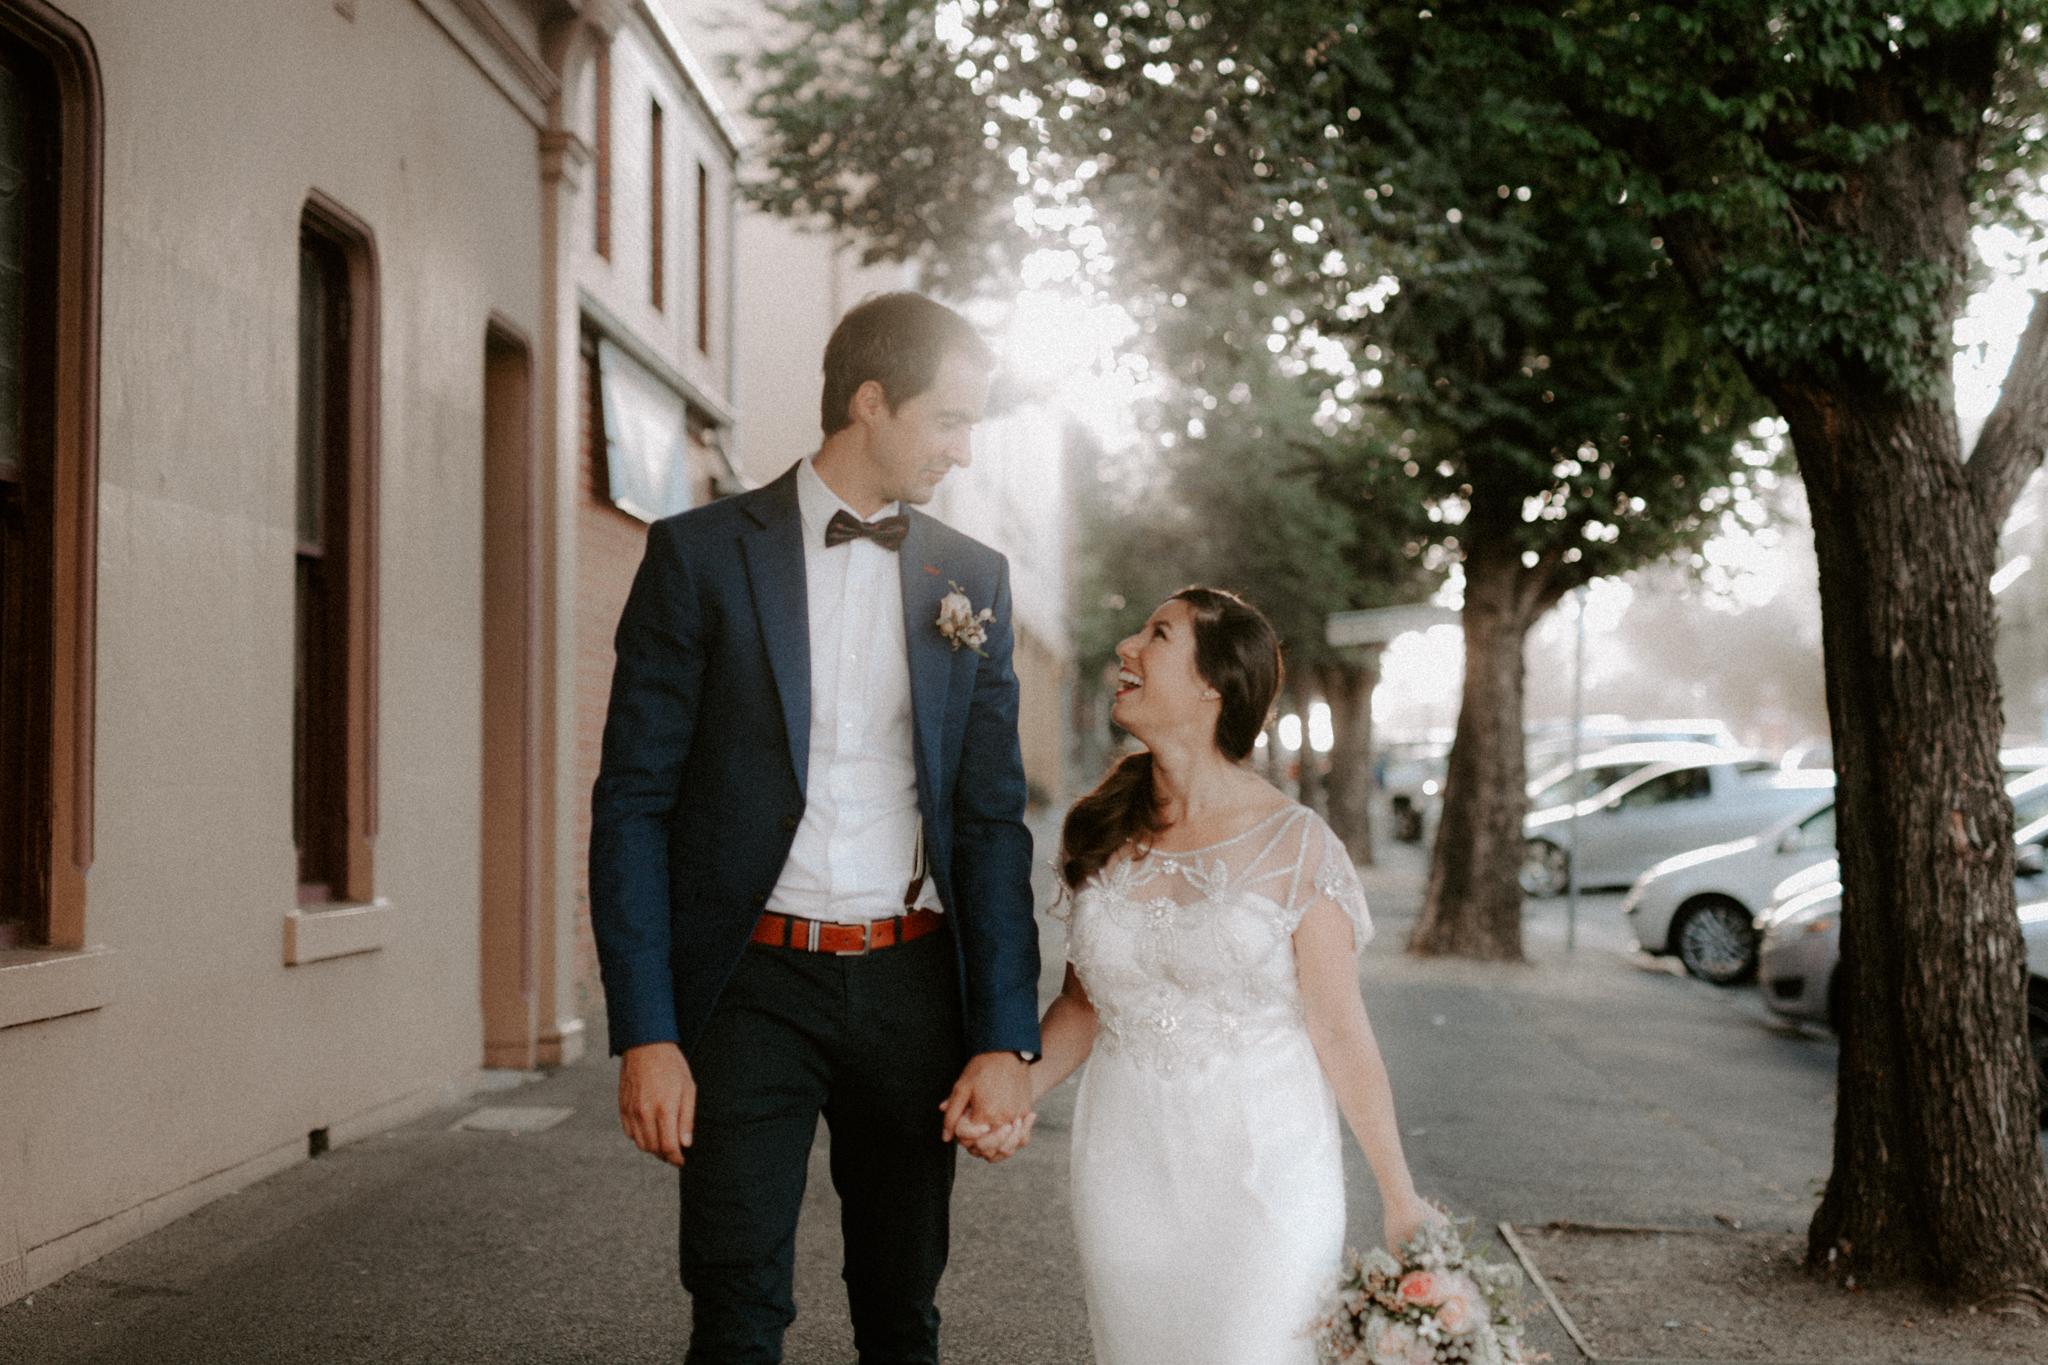 St-Ali-Wedding-Emotions-and-Math-Photography-053.jpg